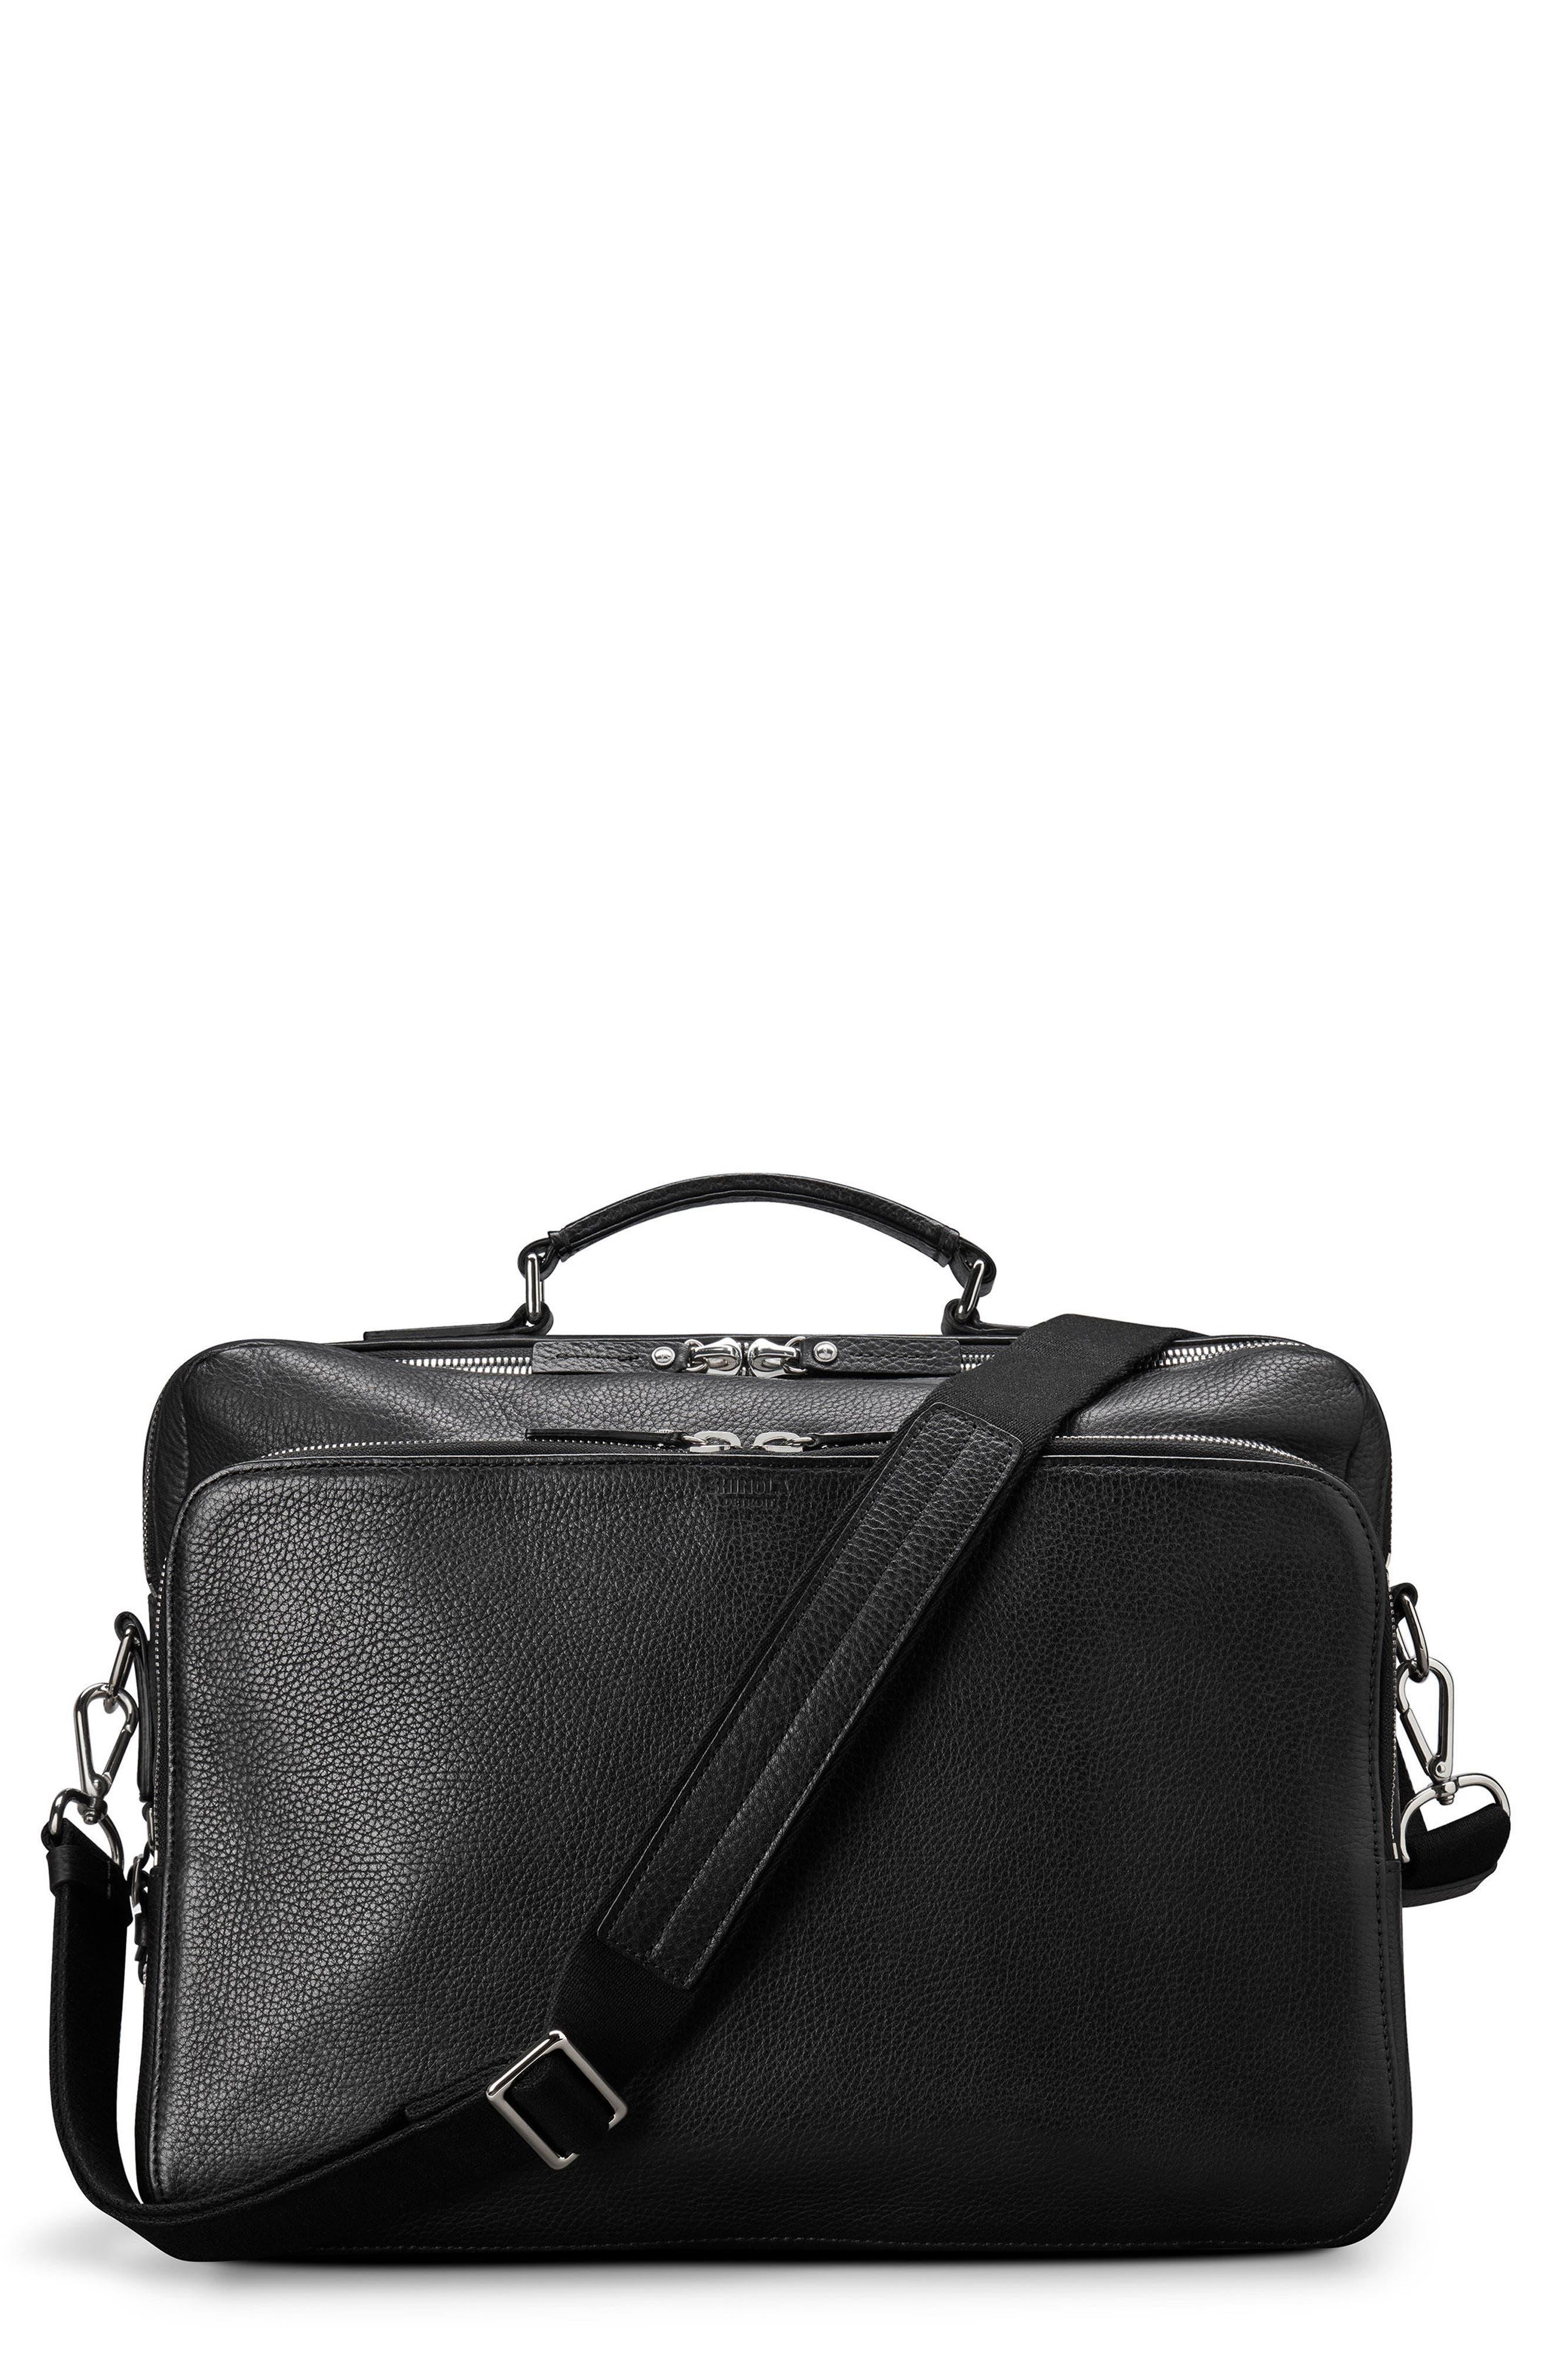 Shinola Canfield Briefcase